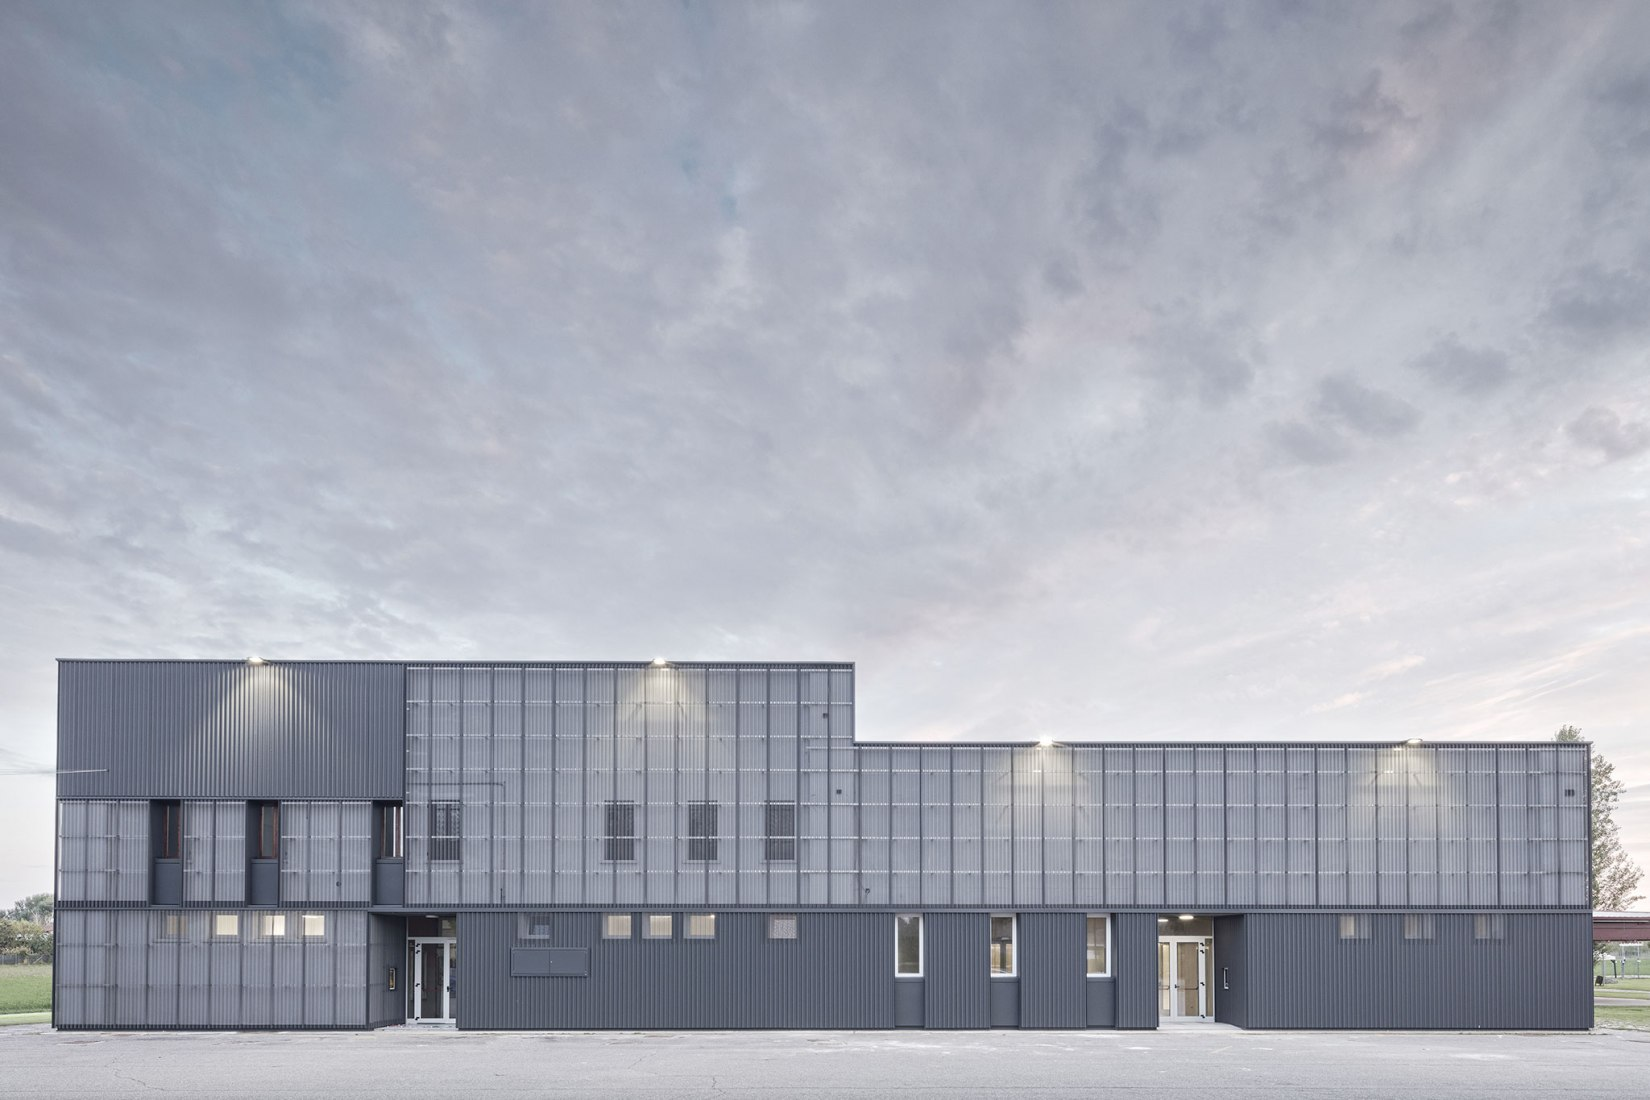 New multi-purpose hall by KM 429 architettura. Photograph by Davide Galli